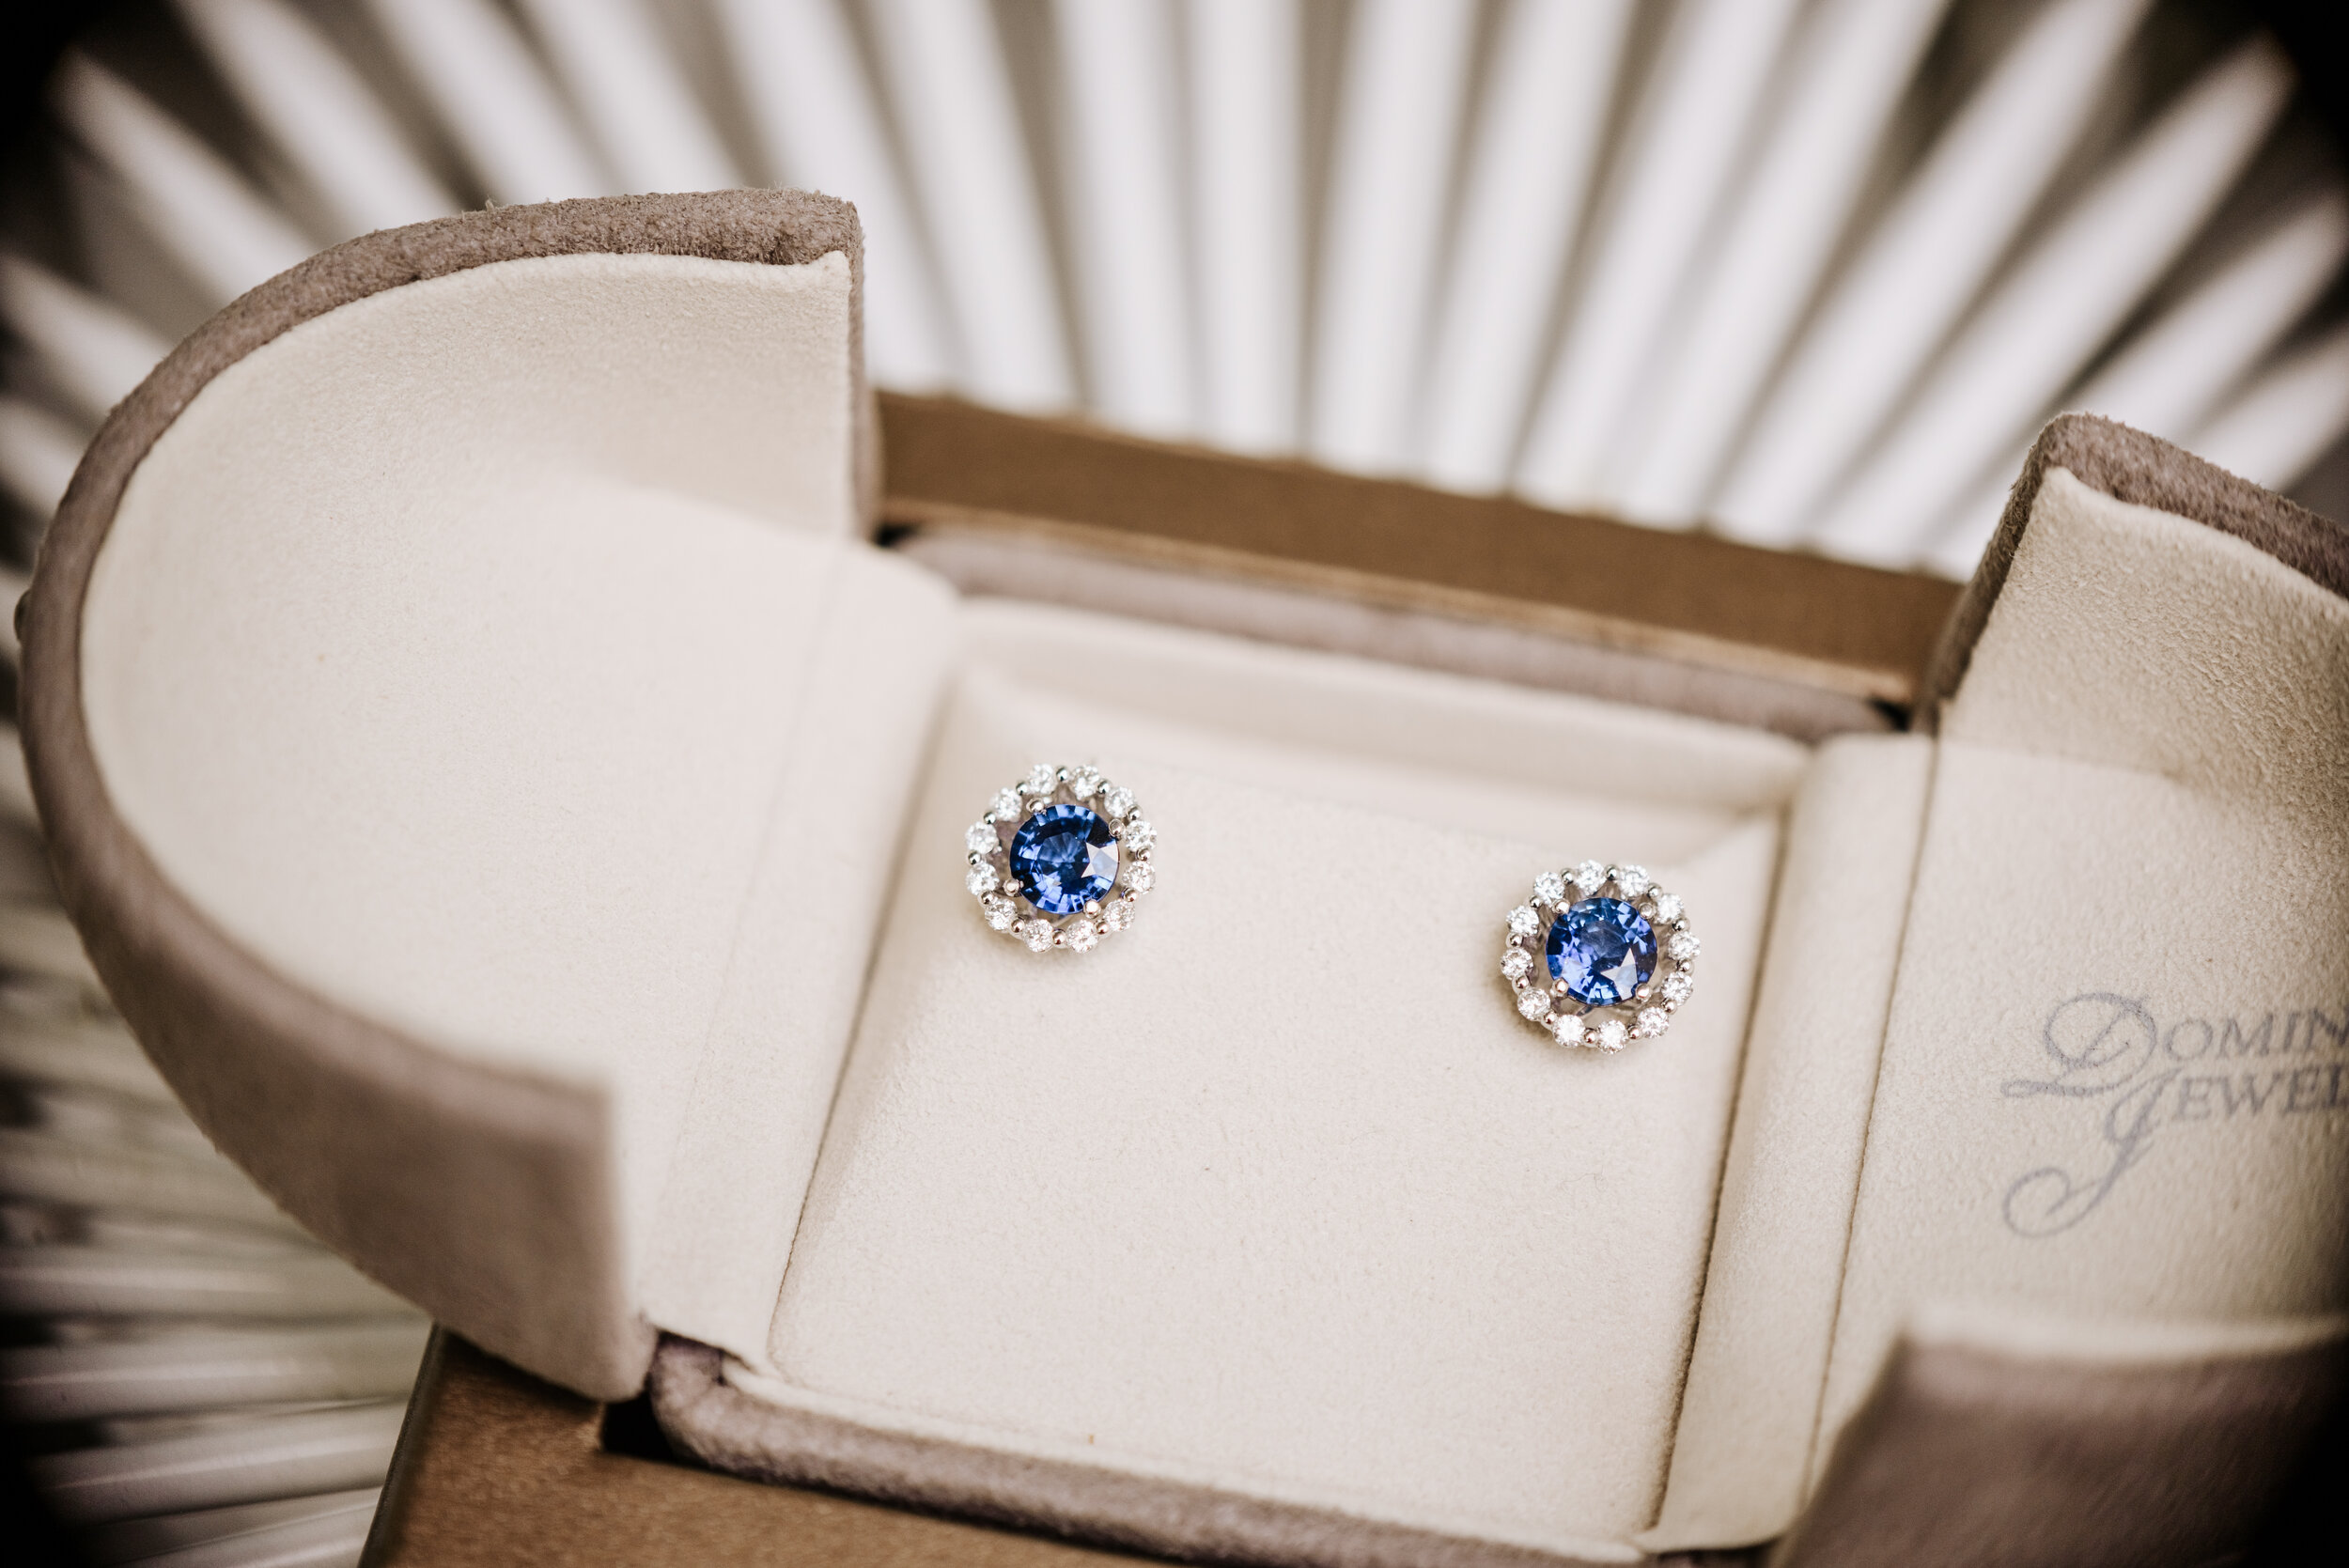 Cassie-Mrunal-Wedding-Quirk-Hotel-John-Marshall-Ballrooms-Richmond-Virginia-Photography-by-V-10.jpg